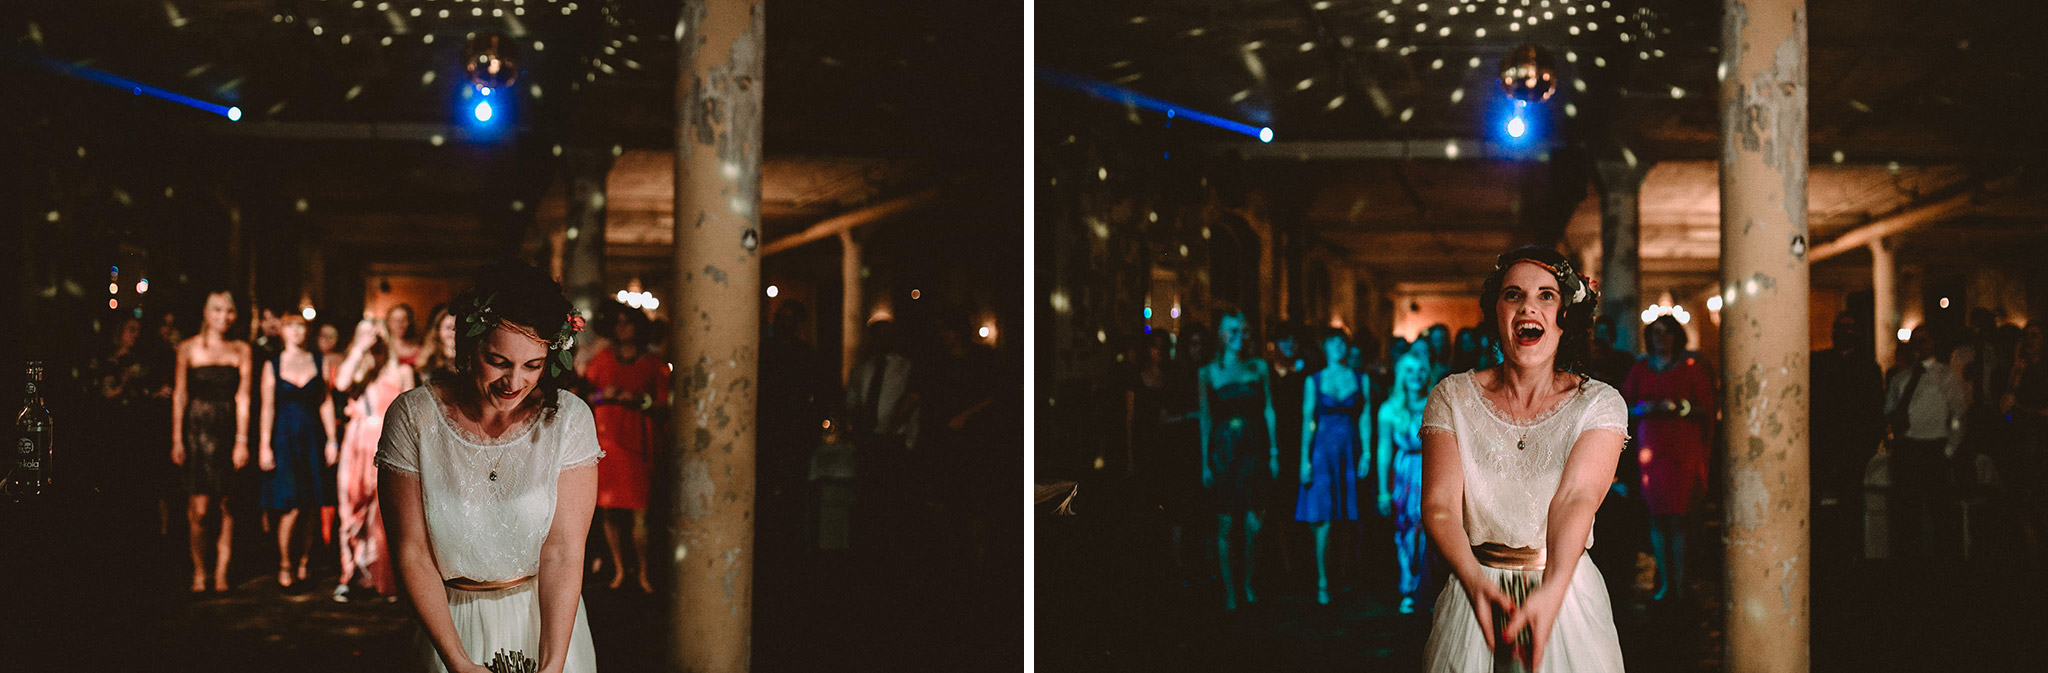 the best wedding photographer in Berlin, Deutschland